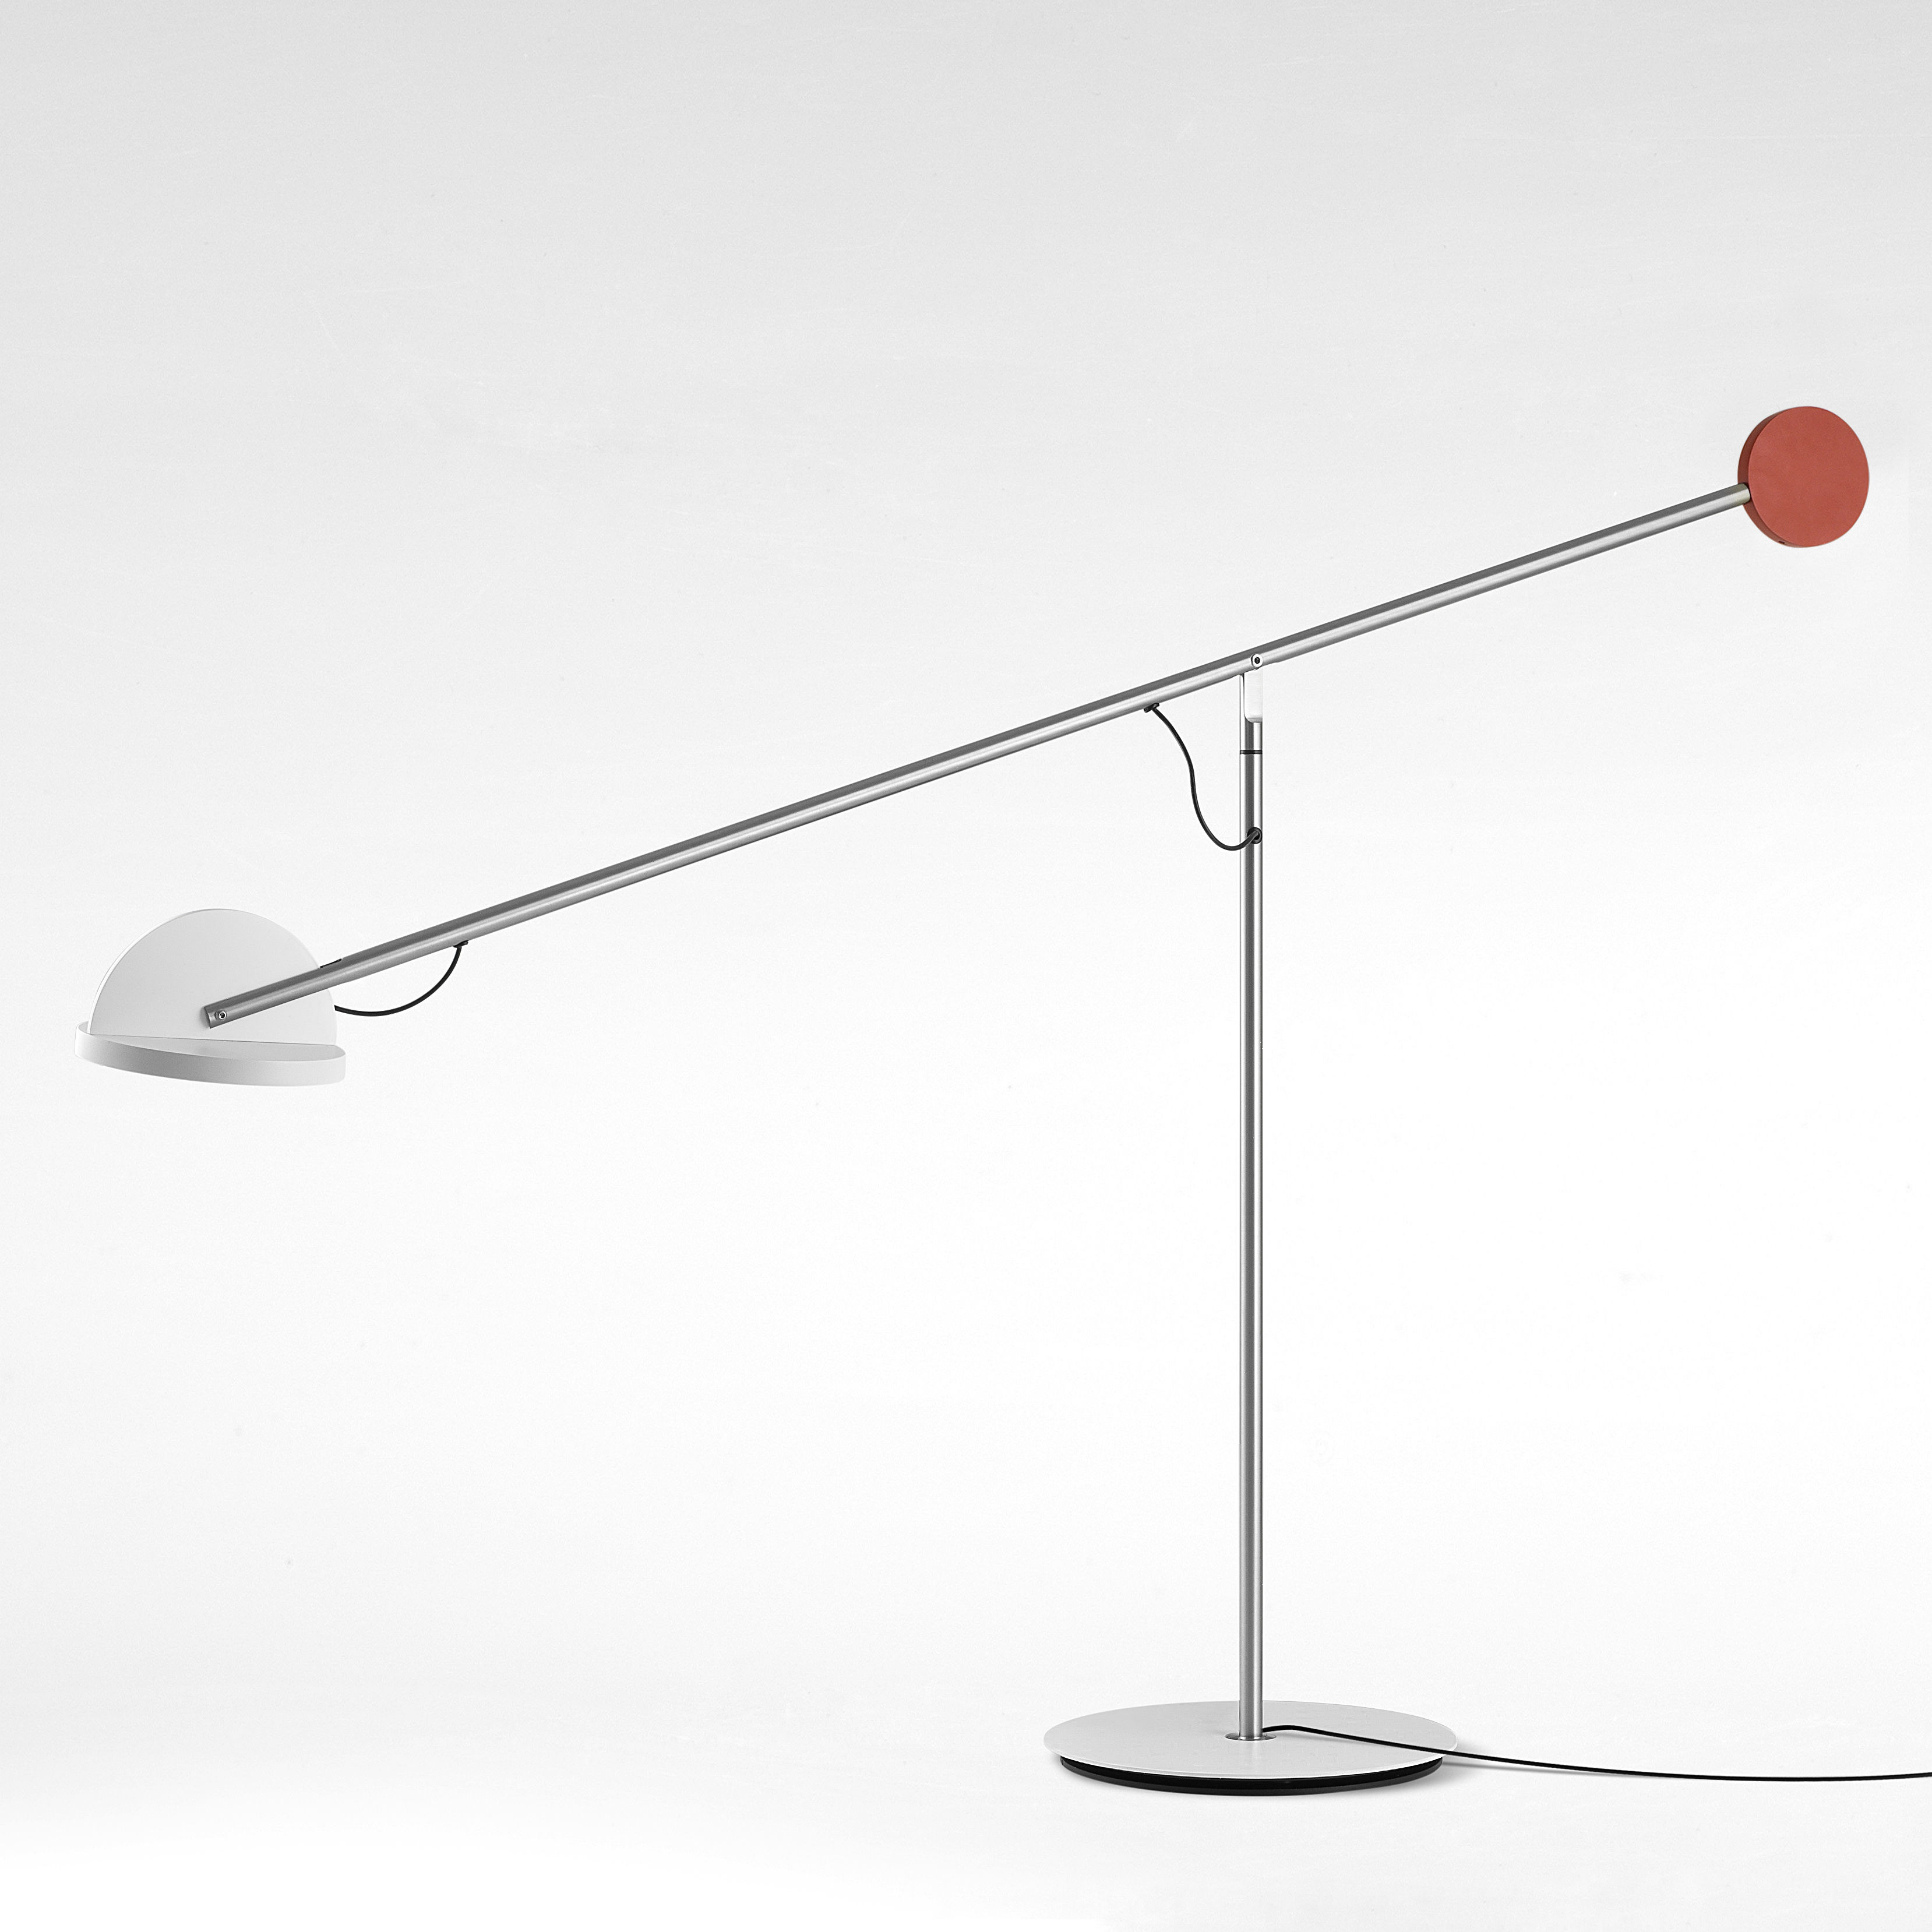 Lighting - Table Lamps - Copérnica Table lamp - / H 60 cm by Marset - Nickel / White & red - Aluminium, Nickel, Steel